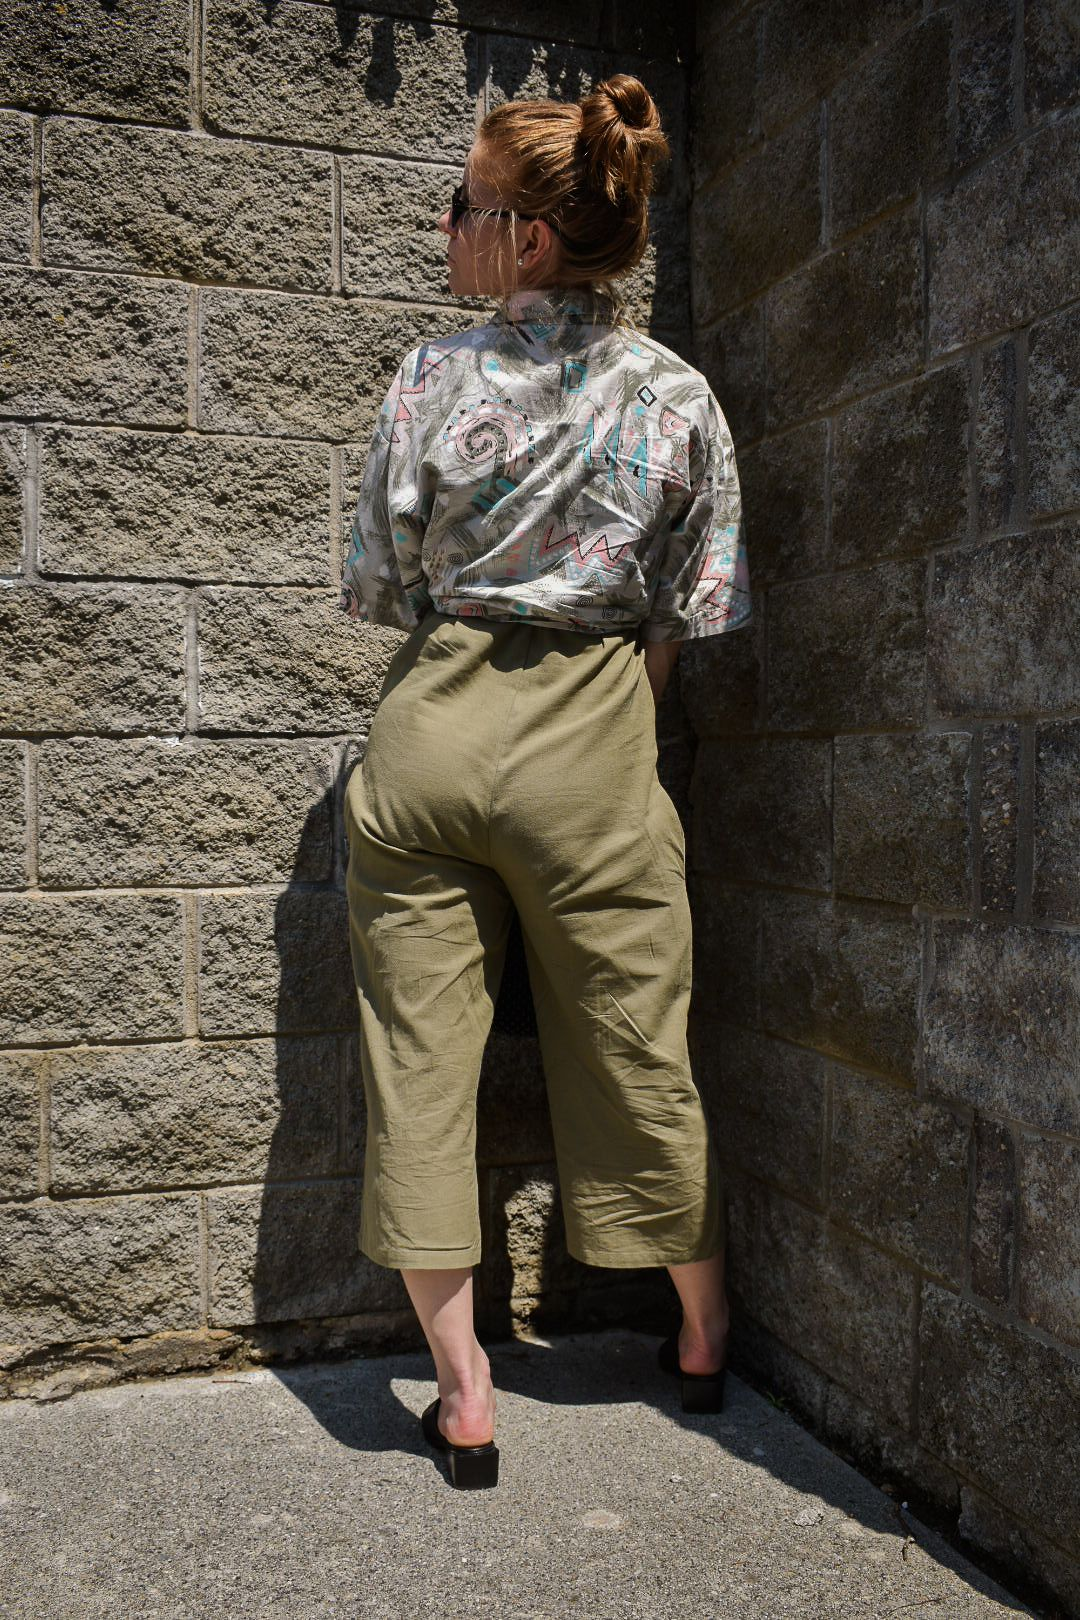 d0ff84564fa9 Wearing Nastygal linen jumpsuit (Sale) Judy Knapp Vintage Dad shirt  (Backward Glances)